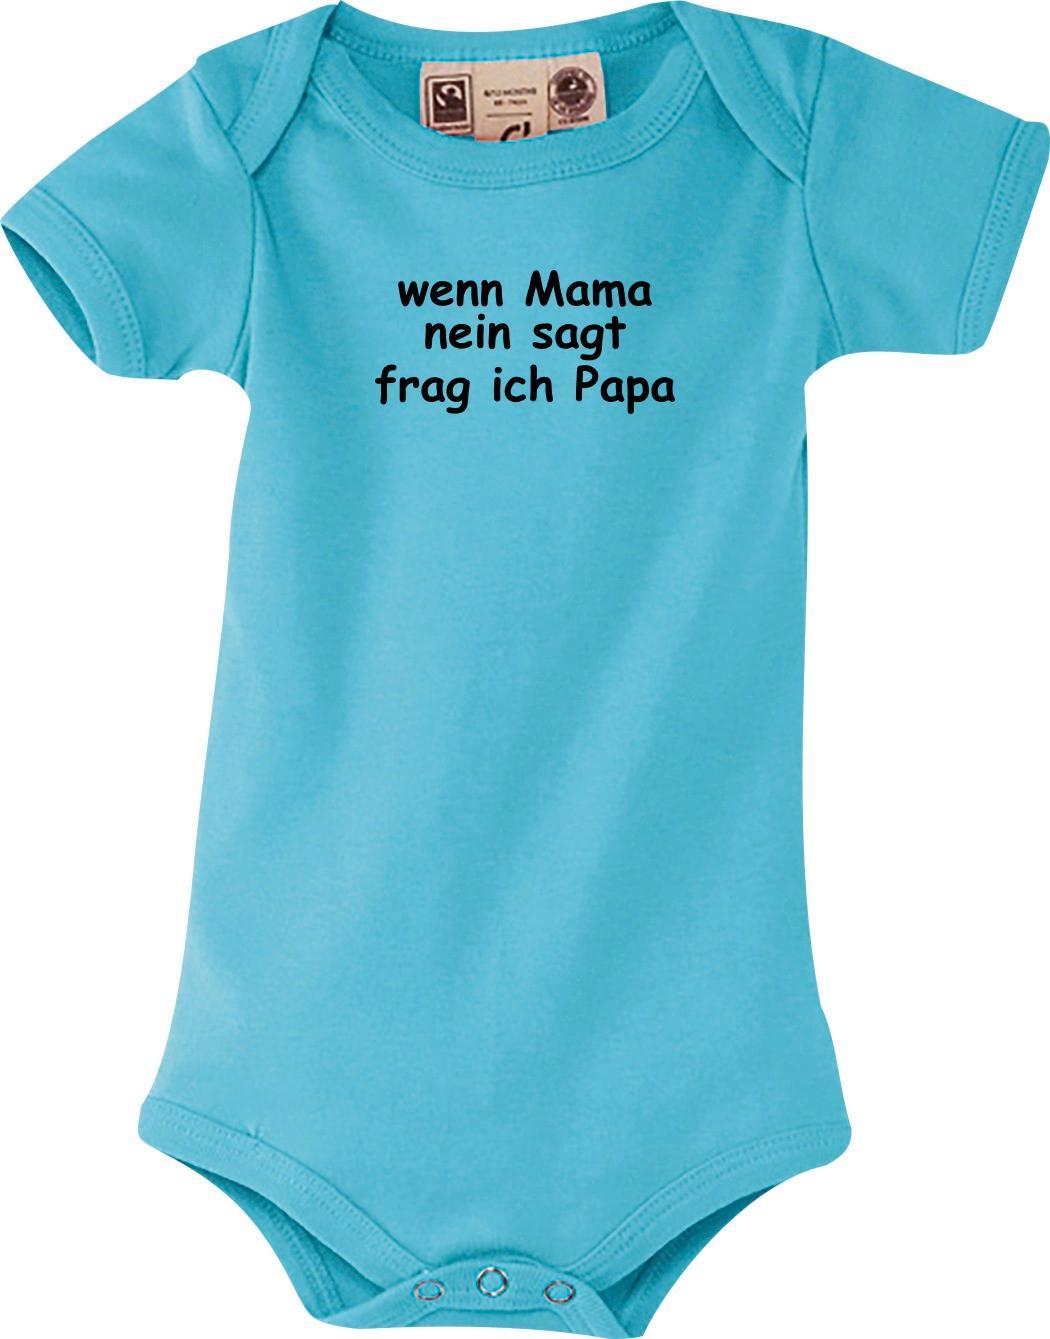 Baby-Body-wenn-Mama-nein-sagt-frag-ich-Papa-kult